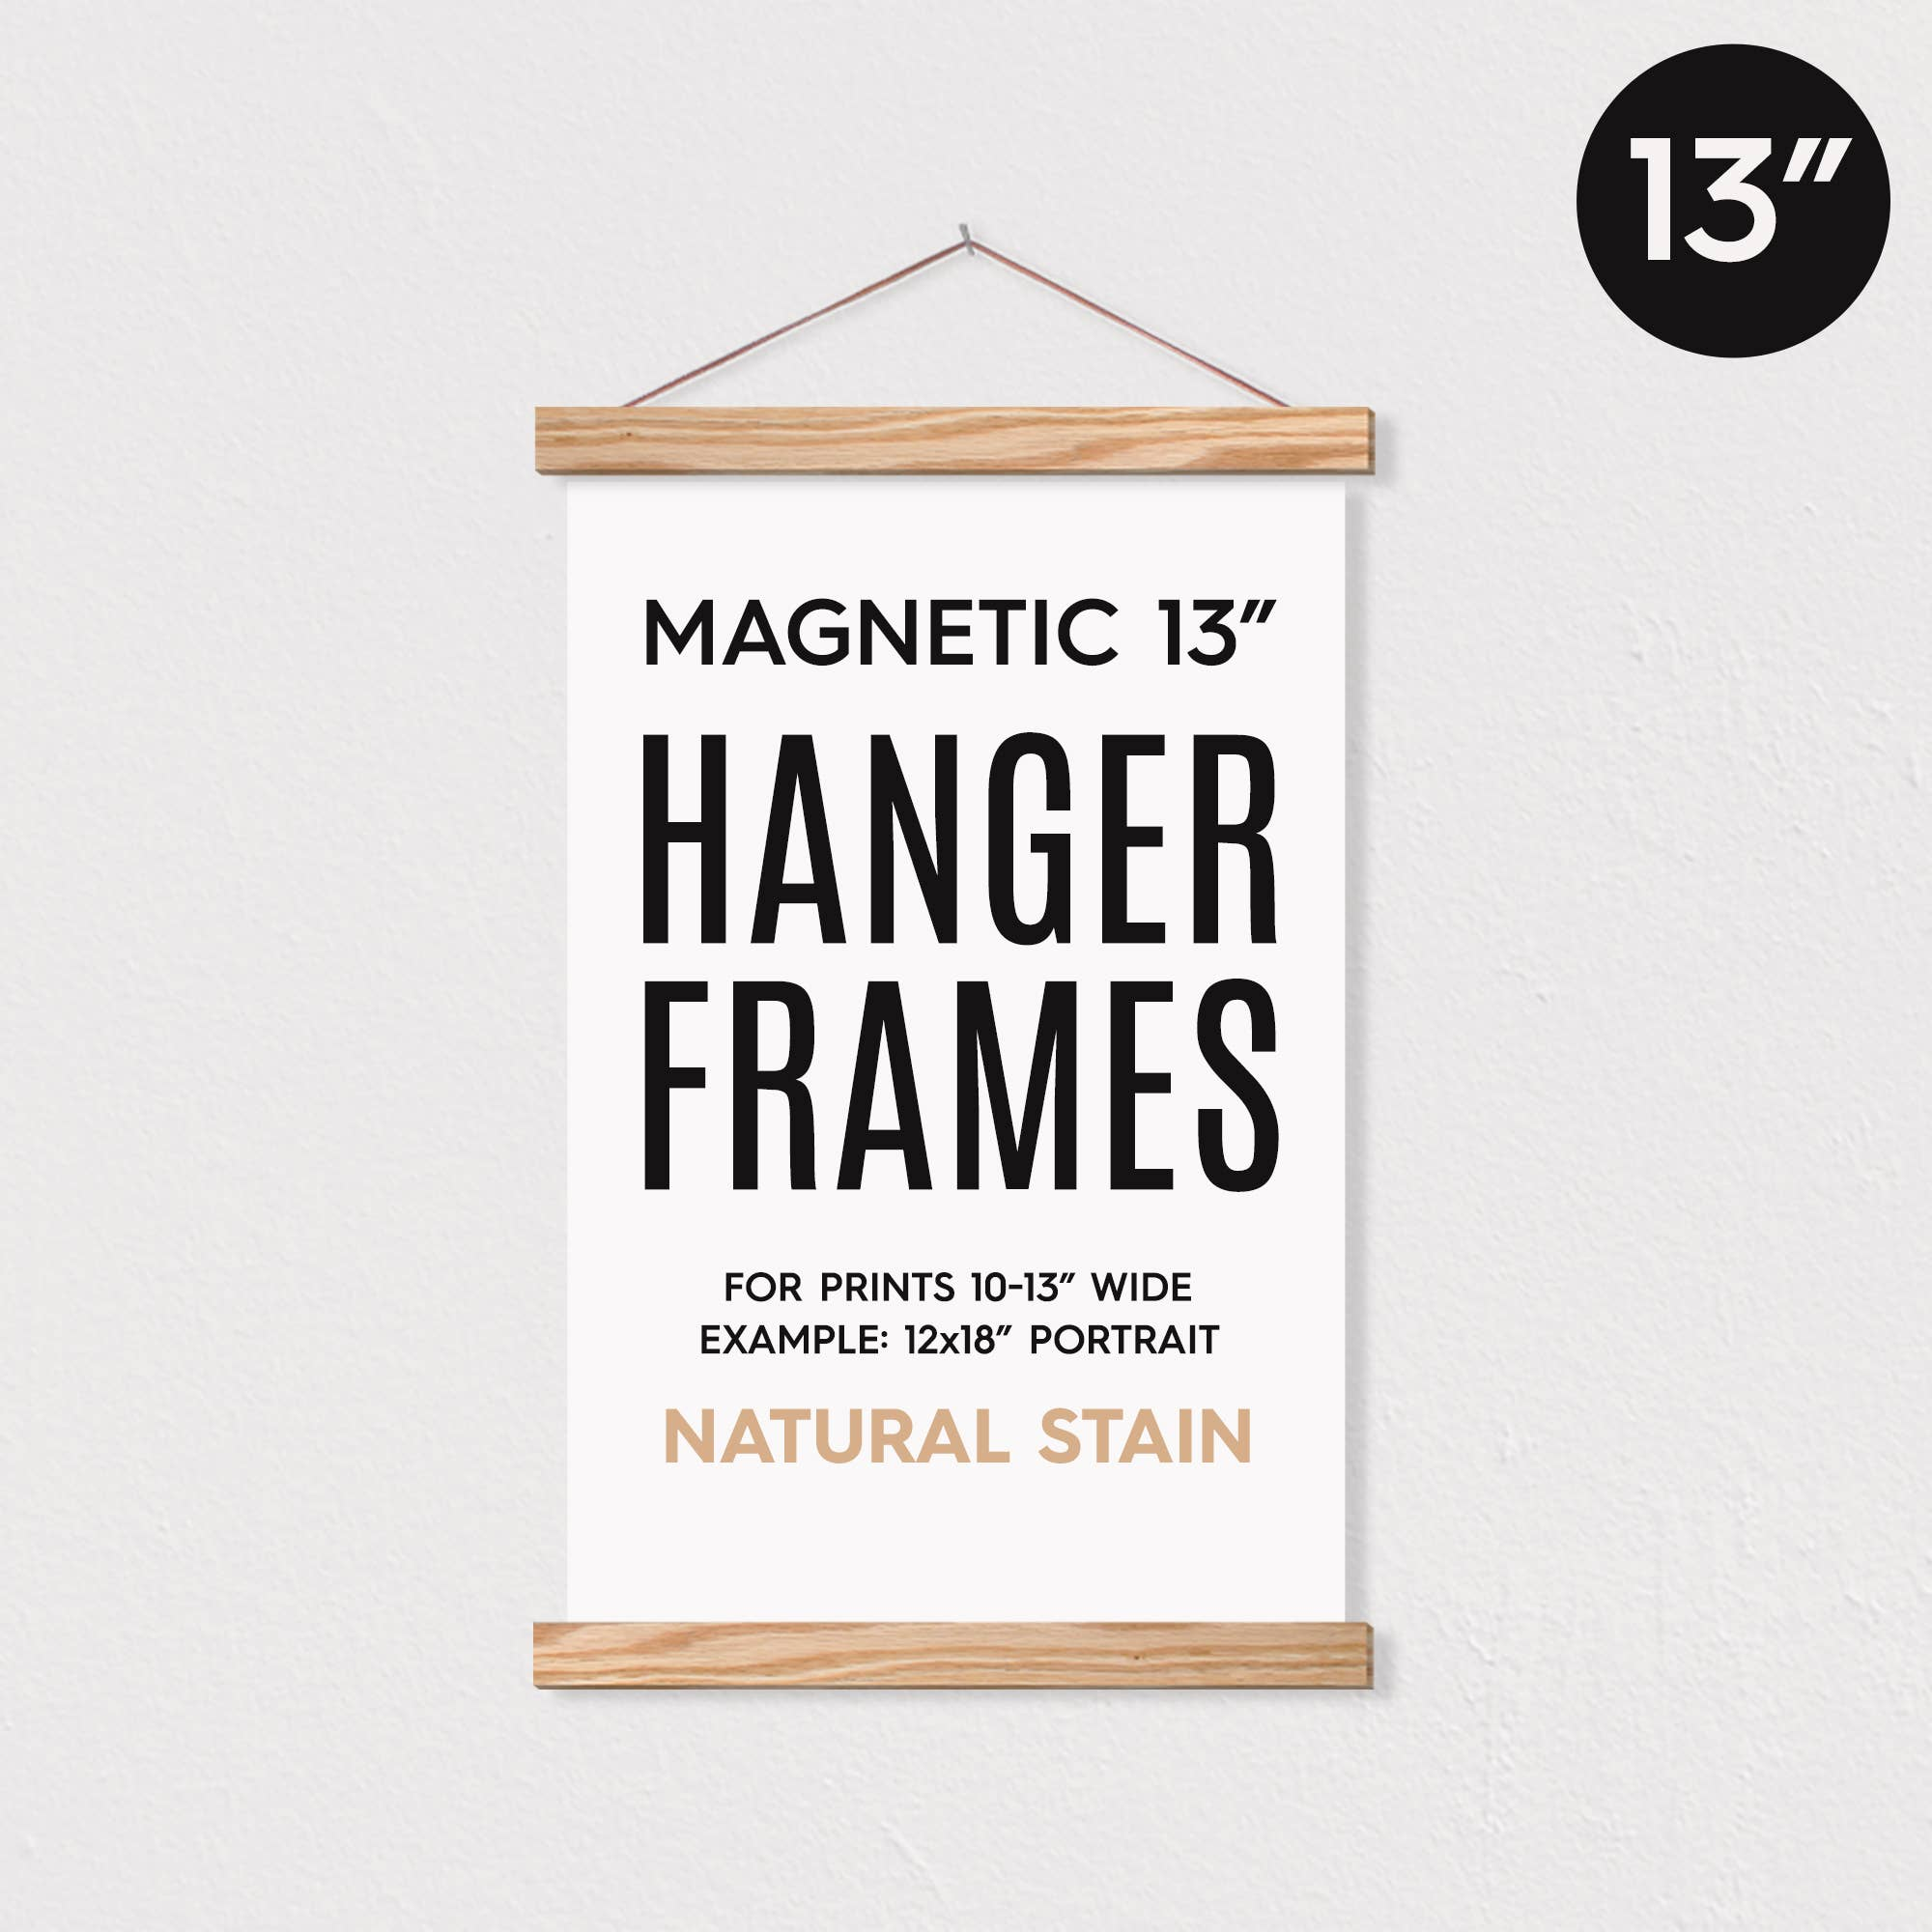 "13"" MAGNETIC Poster Hanger Frame™ for 12x18"" Portrait Prints   Trada Marketplace"